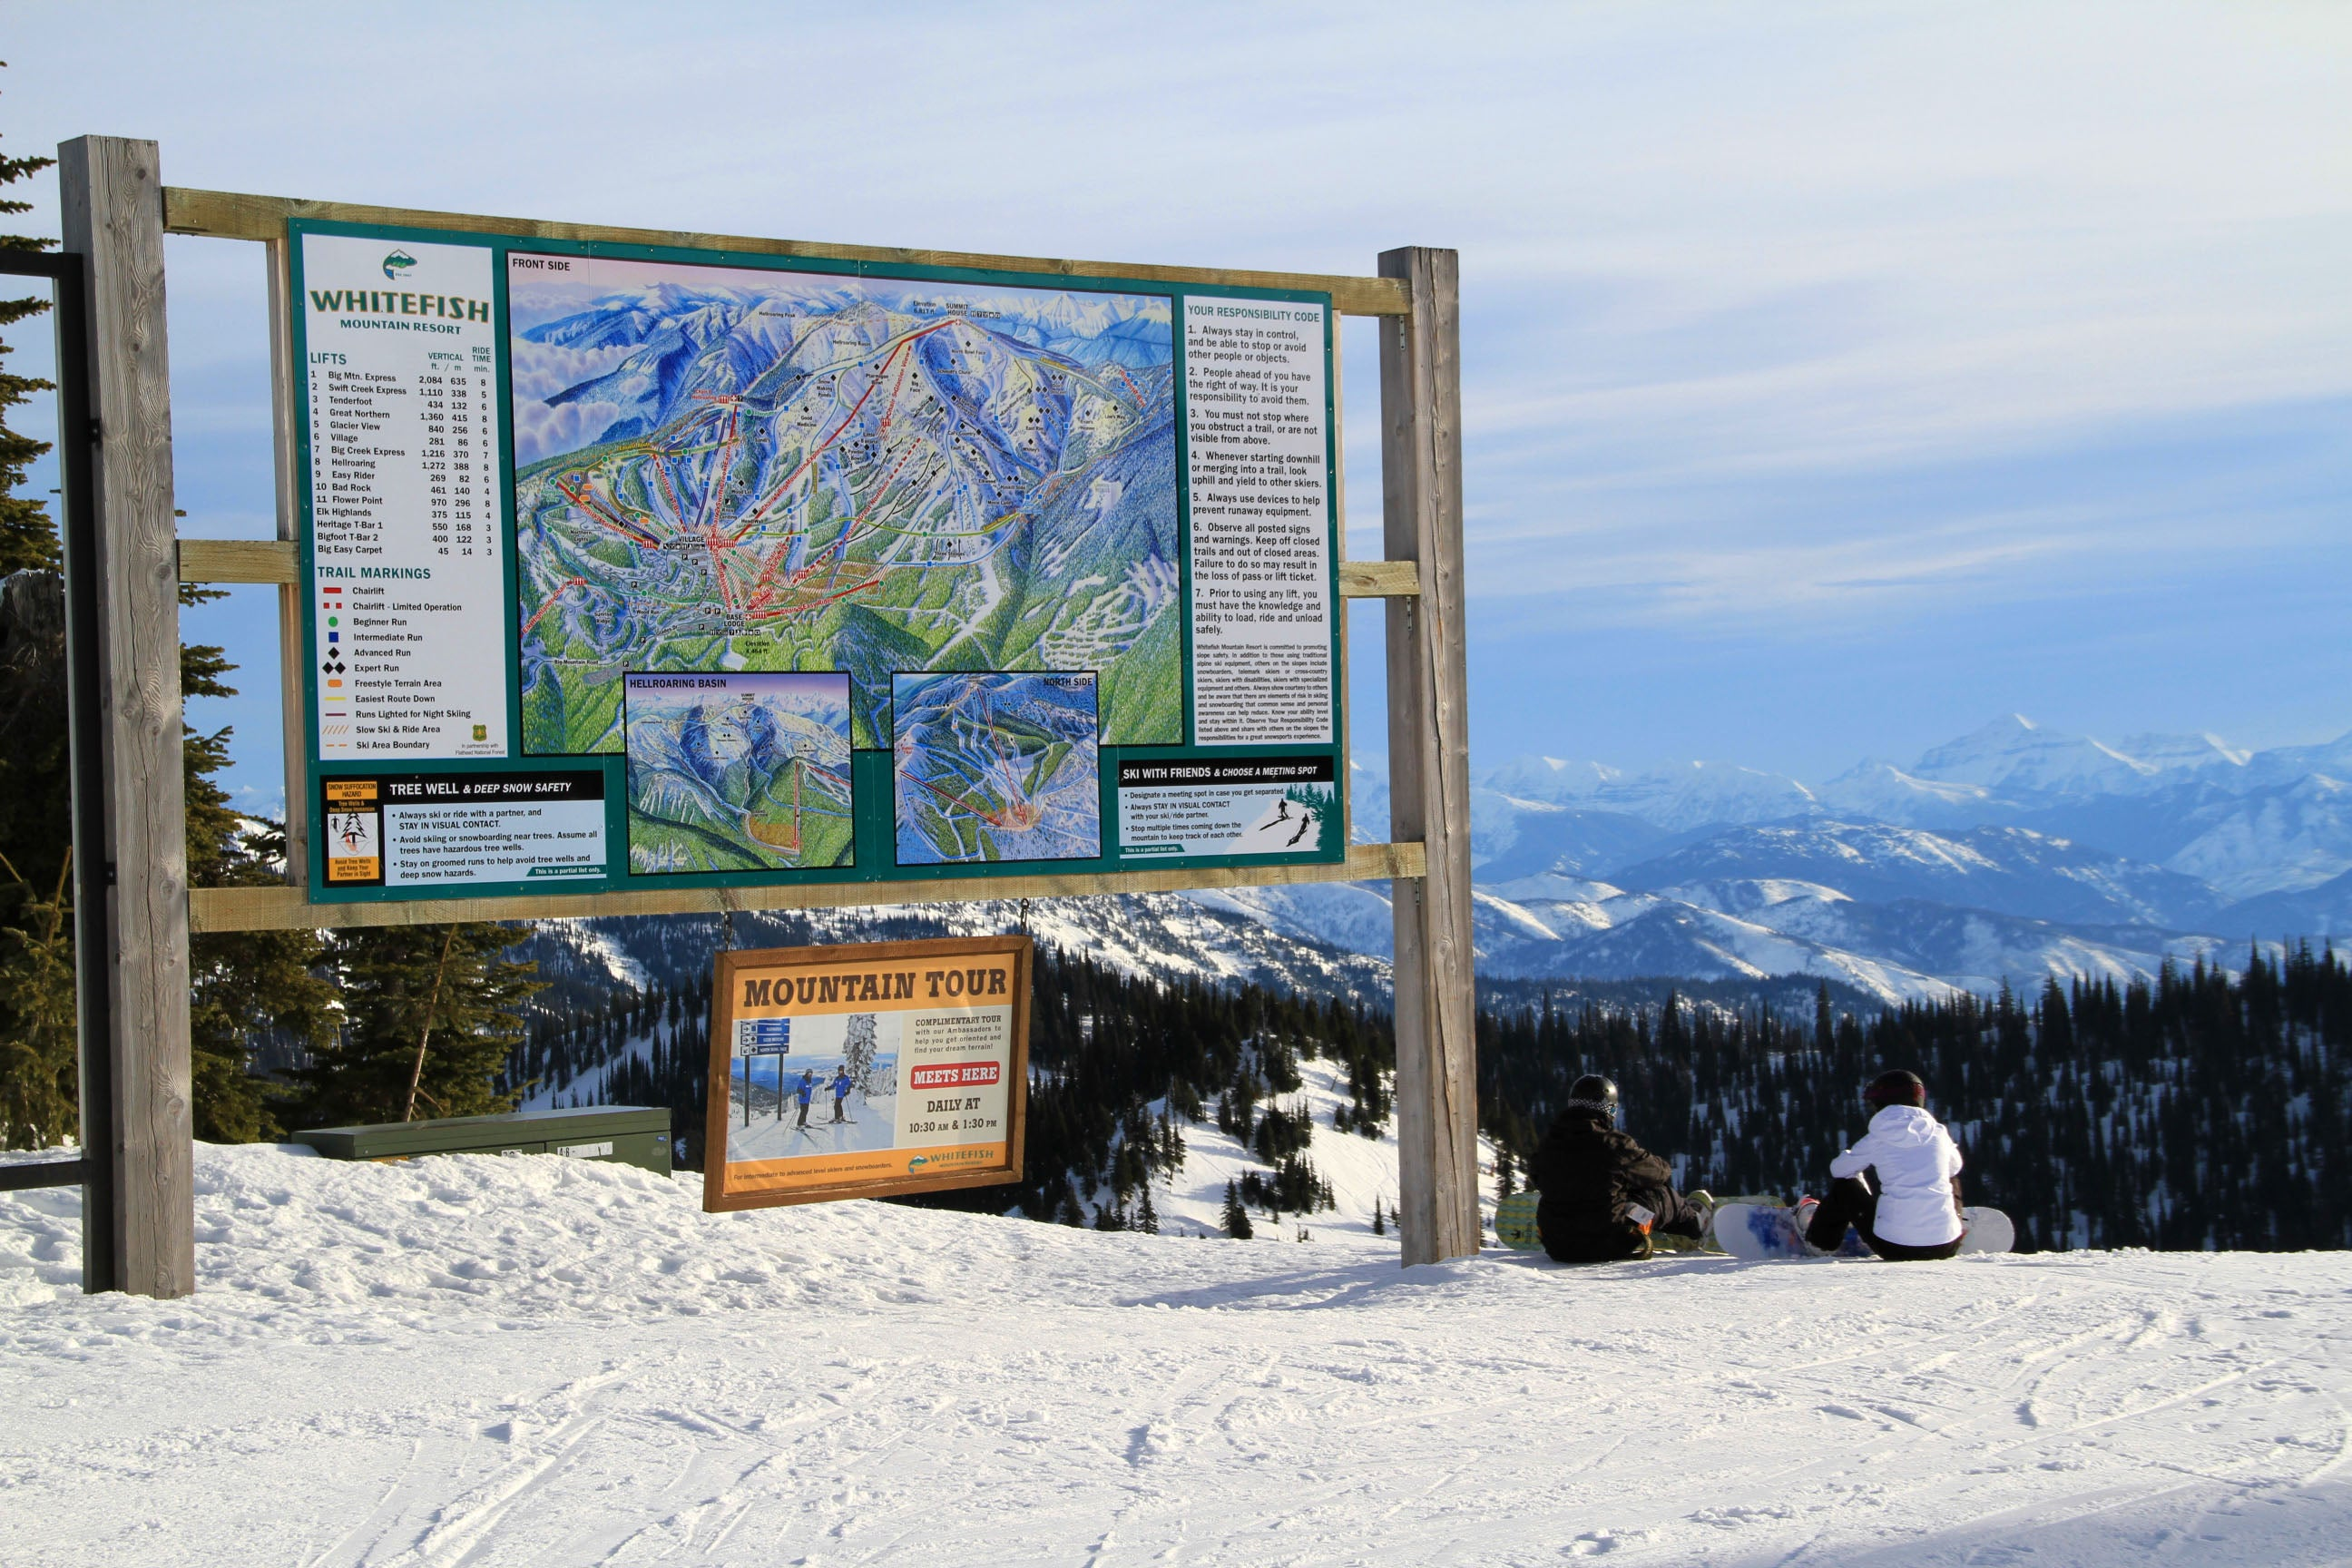 whitefish-summit-sign.jpg